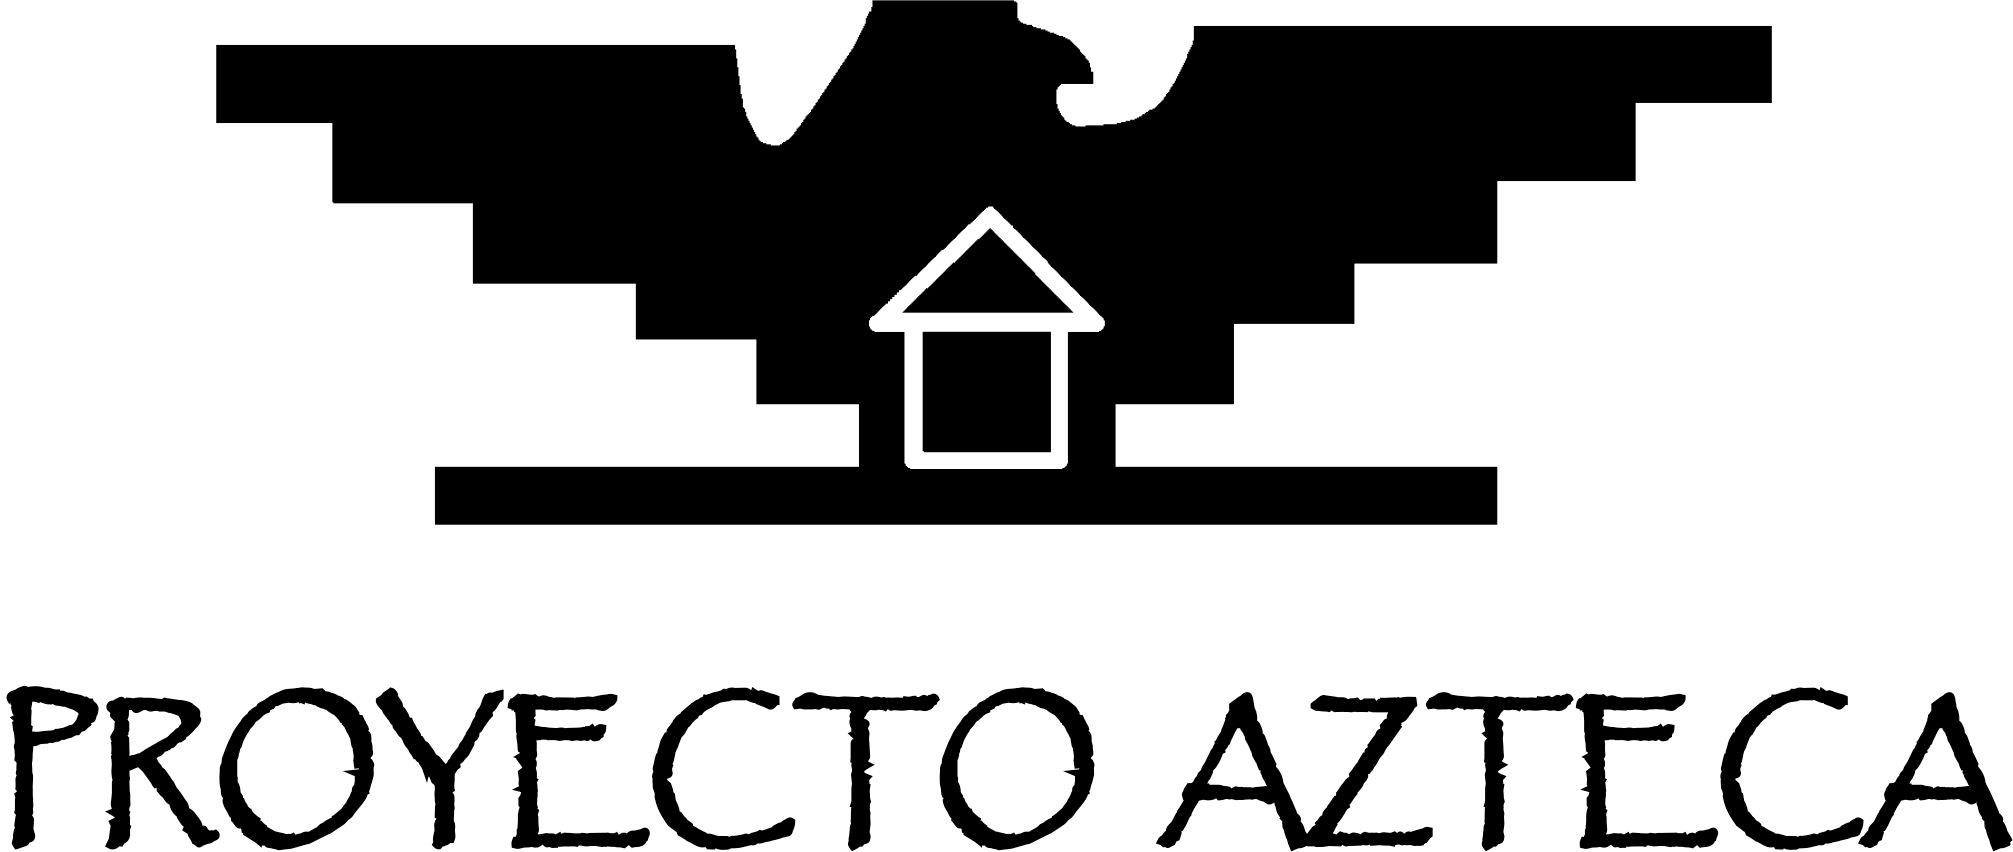 Proyecto Azteca